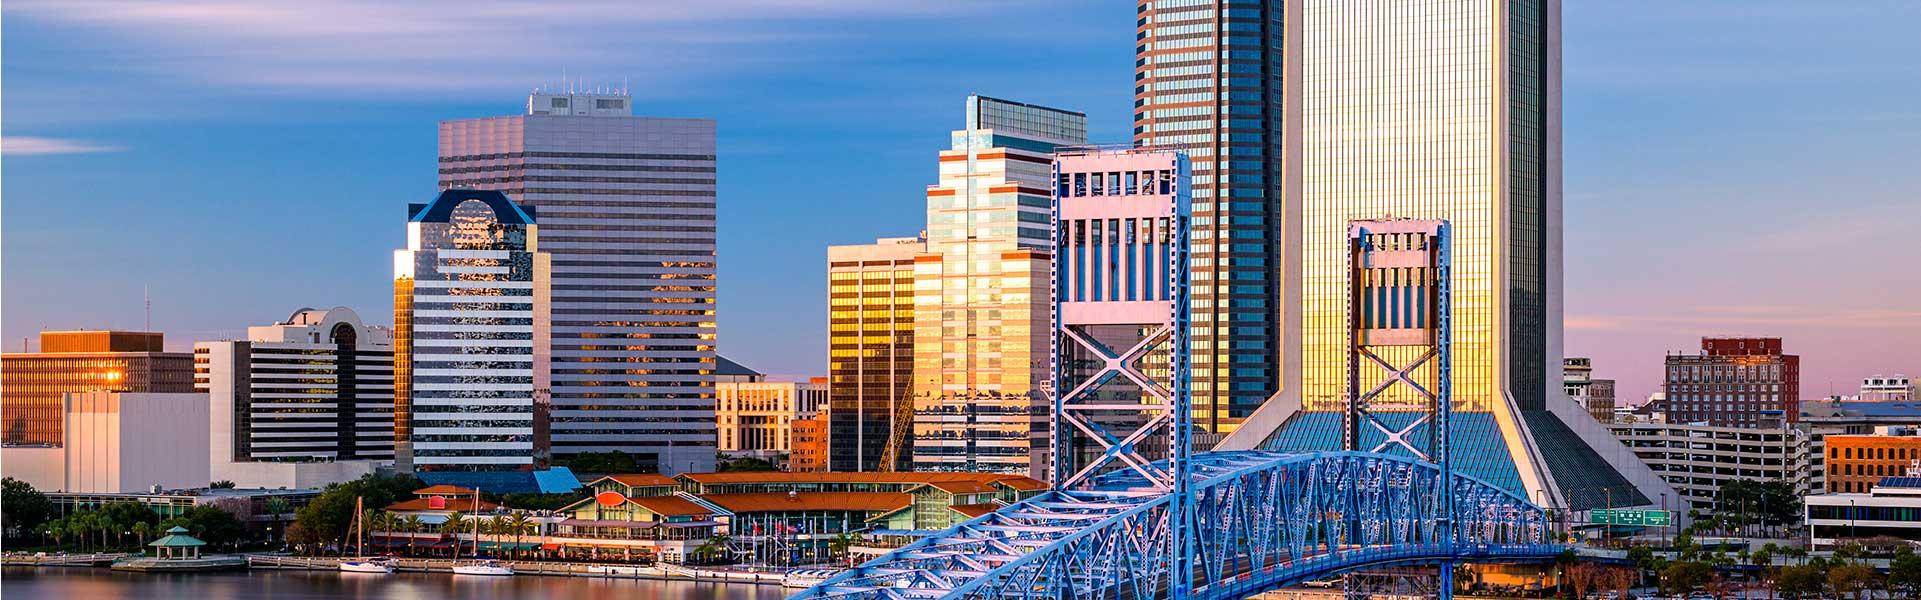 Jacksonville Florida Downtown